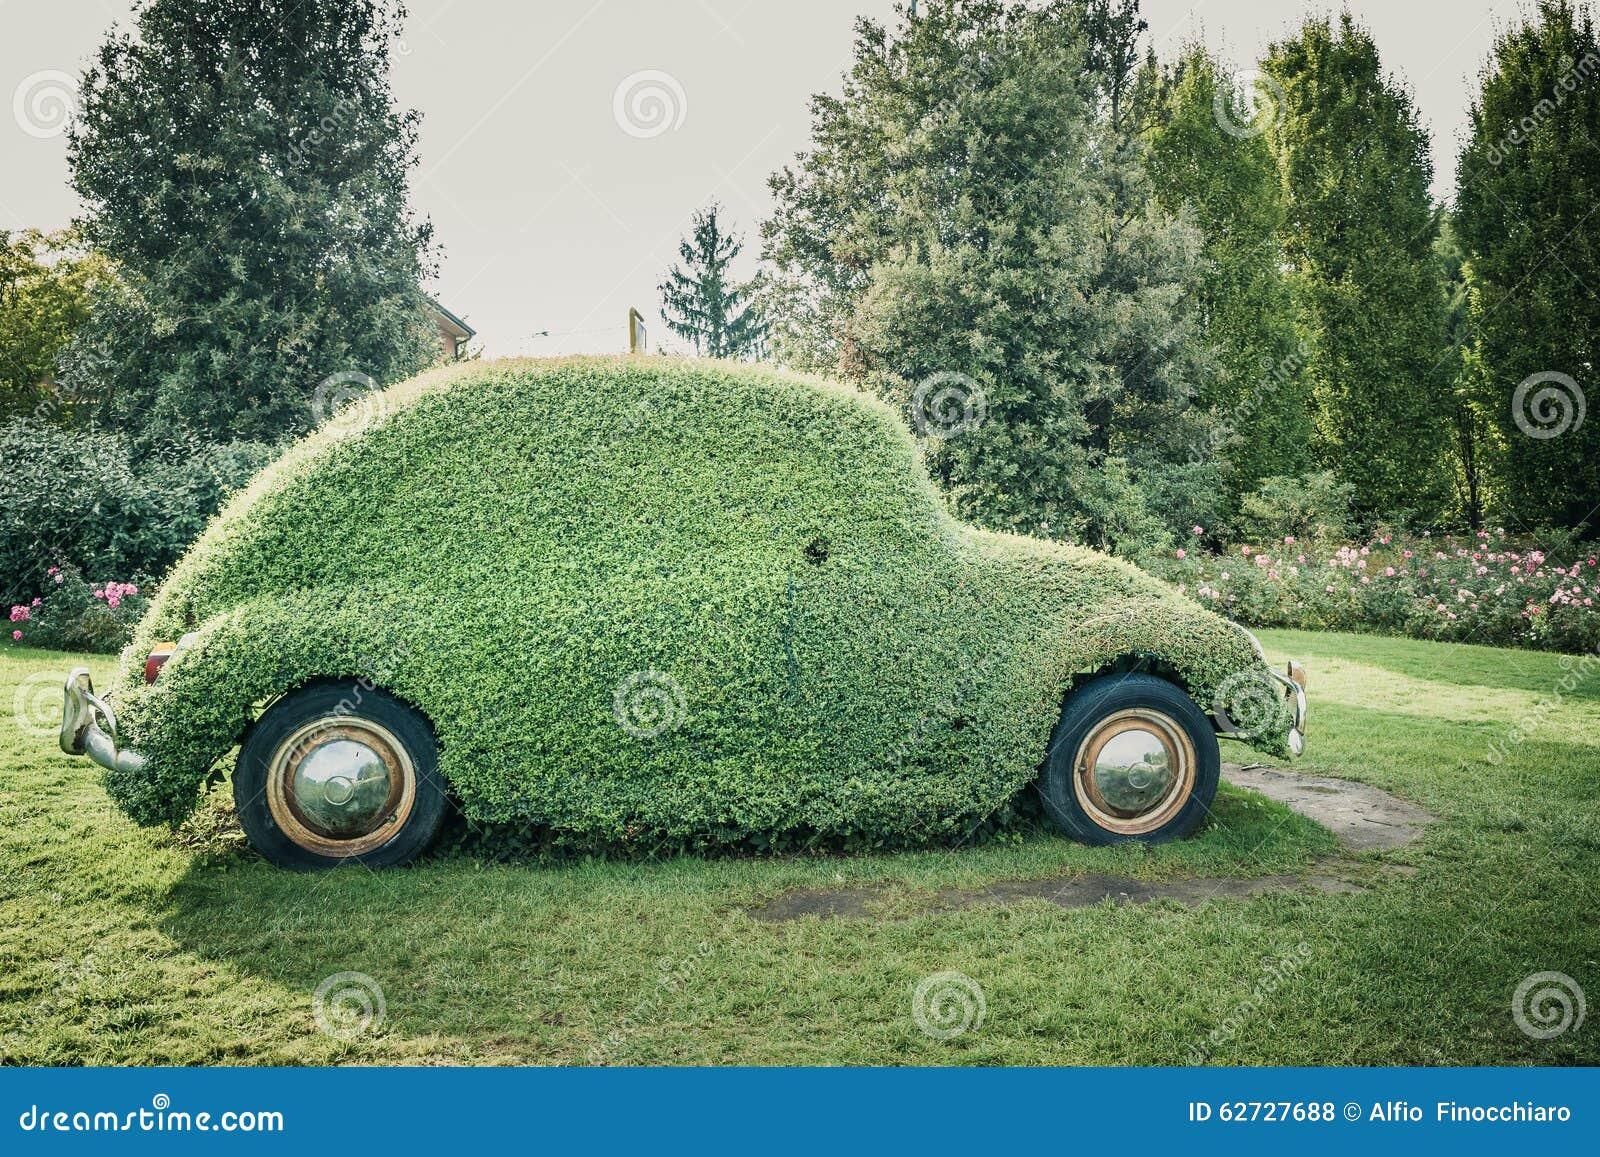 beetle car royalty free stock image. Black Bedroom Furniture Sets. Home Design Ideas